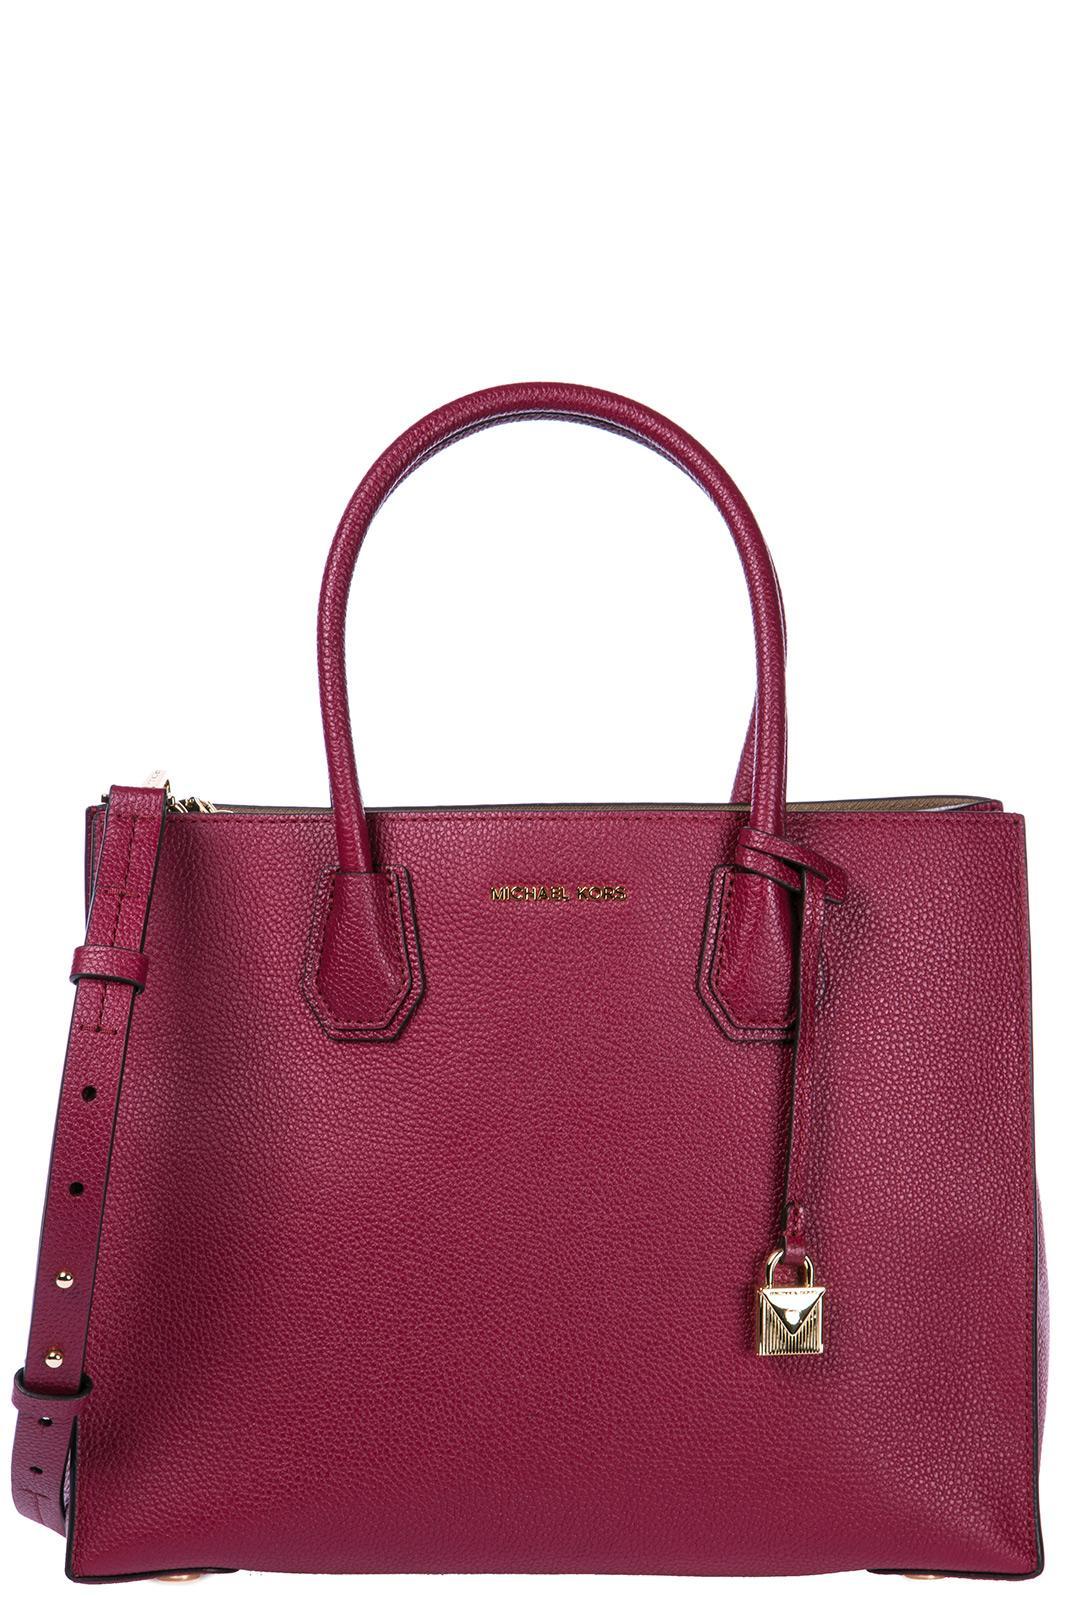 Michael Kors Women's Leather Handbag Shopping Bag Purse Mercer In Brown